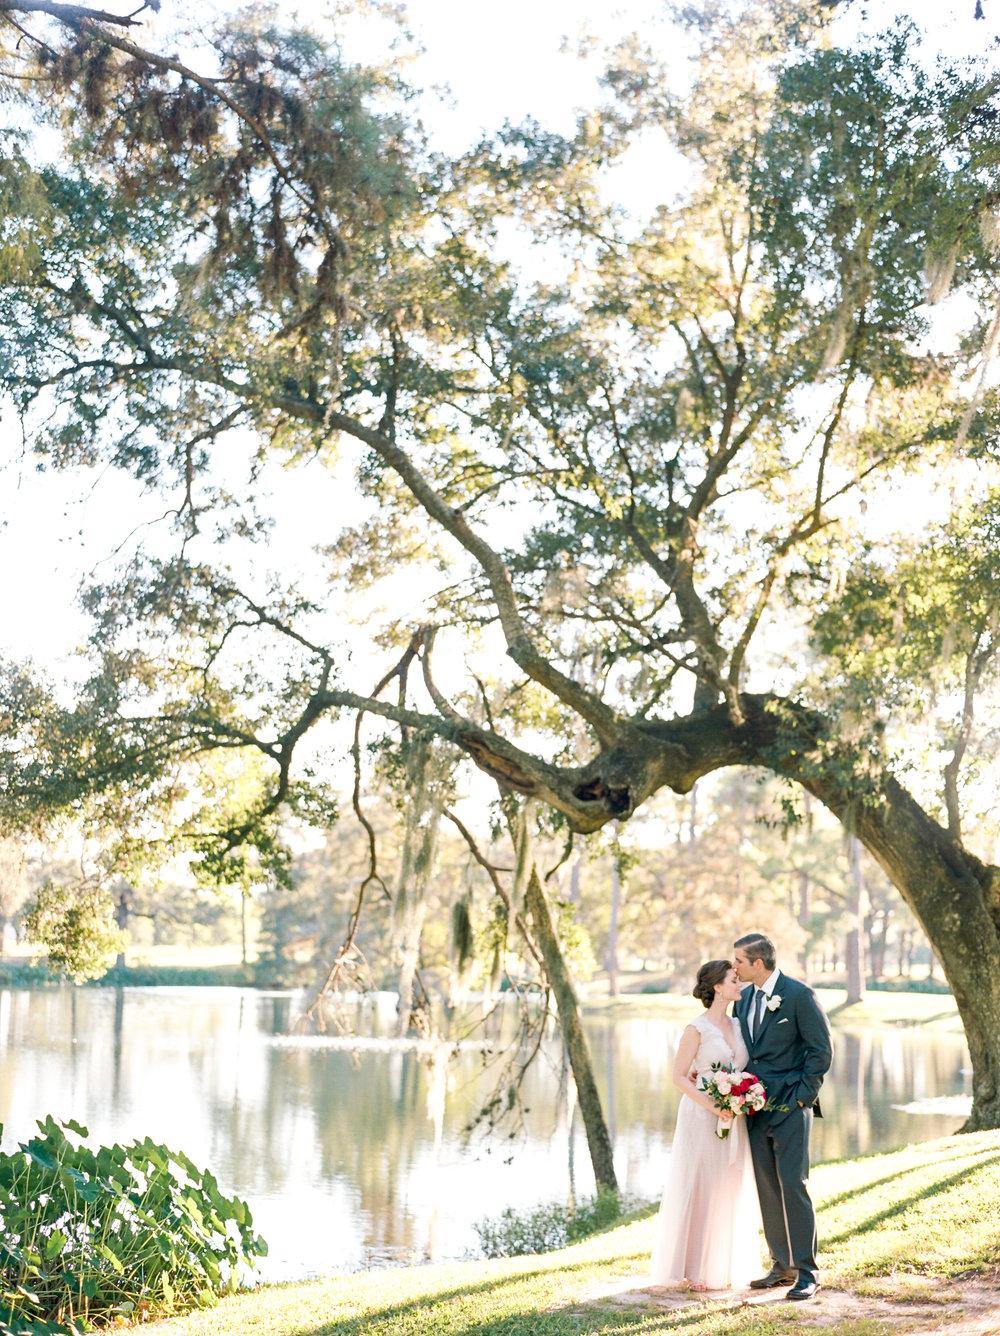 Houston-Wedding-Photographer-Lakeside-Country-Club-First-Look-Bride-Groom-Formals-Film-Fine-Art-Photography-1.jpg